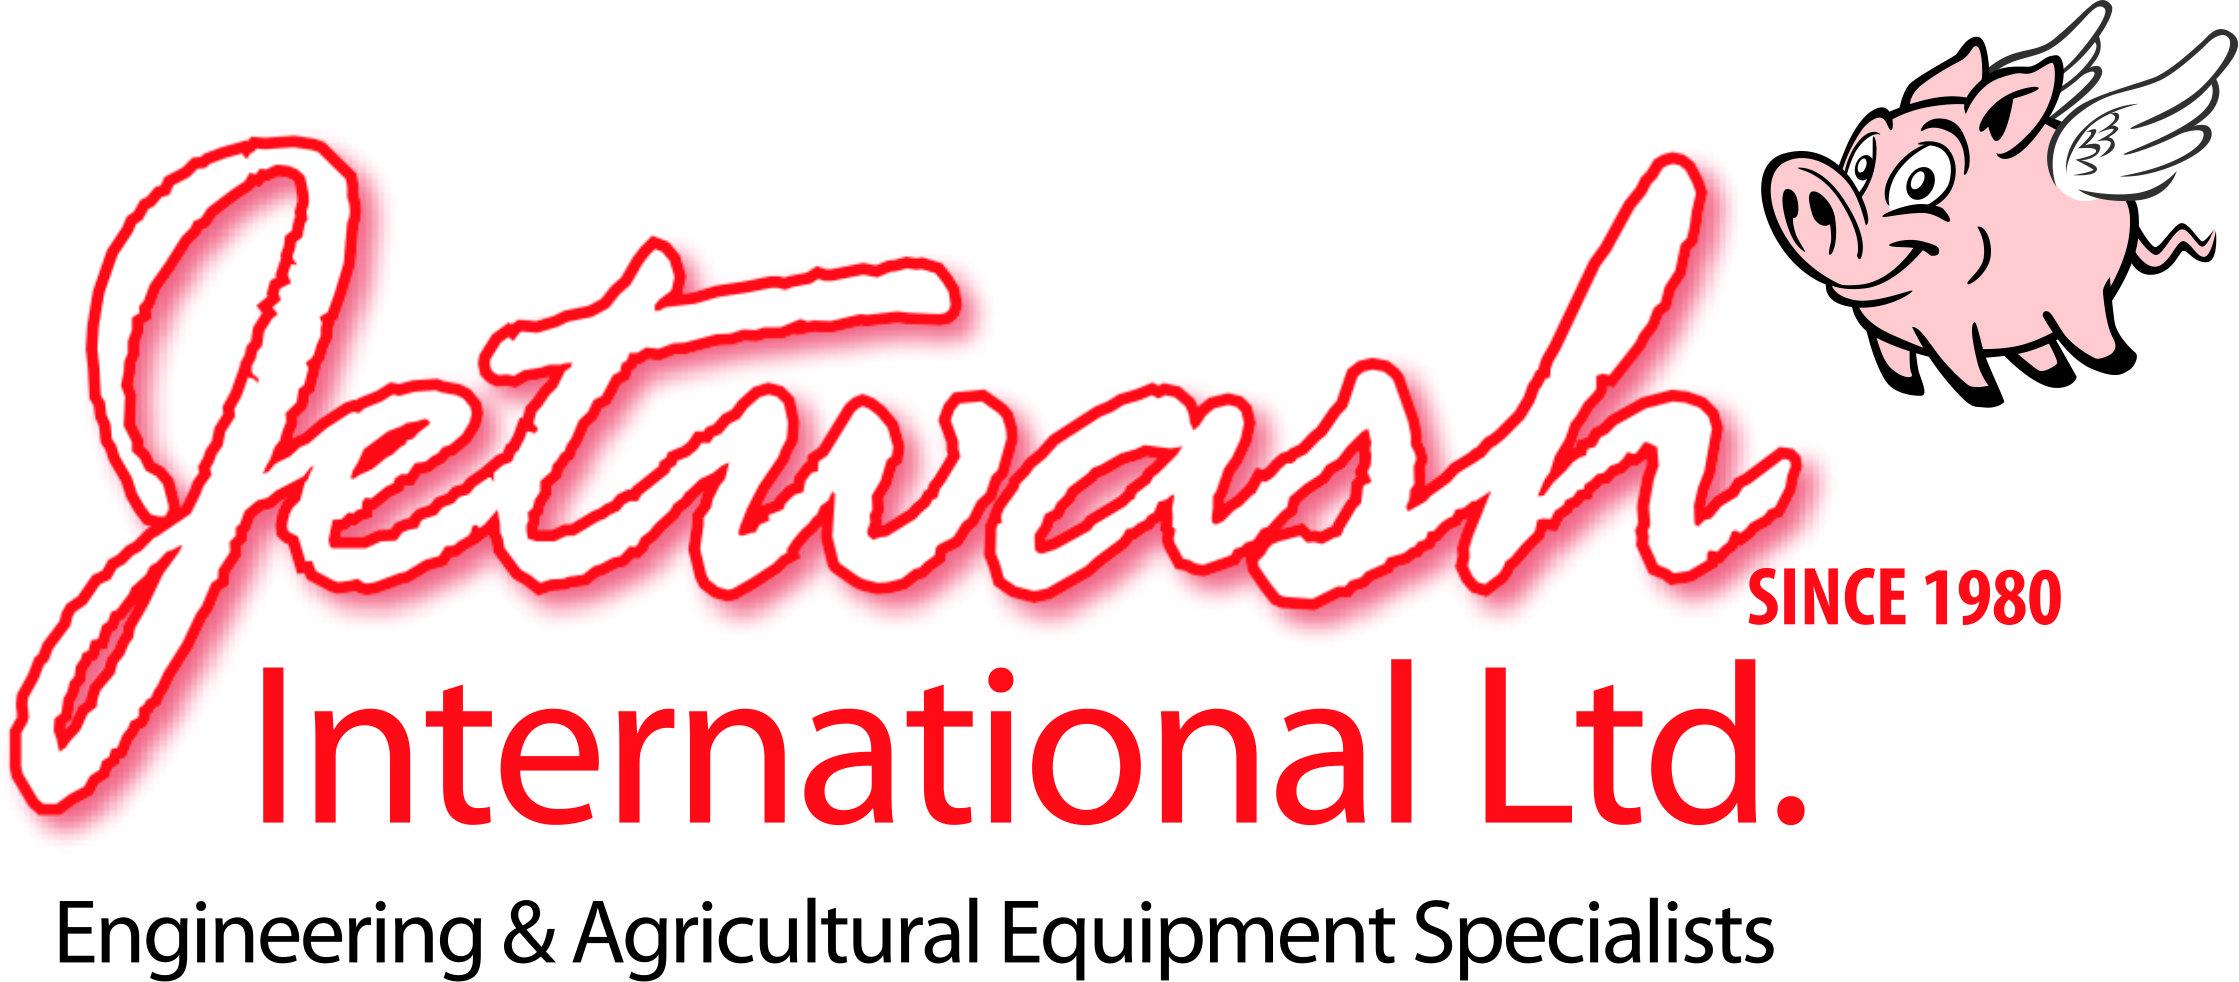 Jetwash International Limited